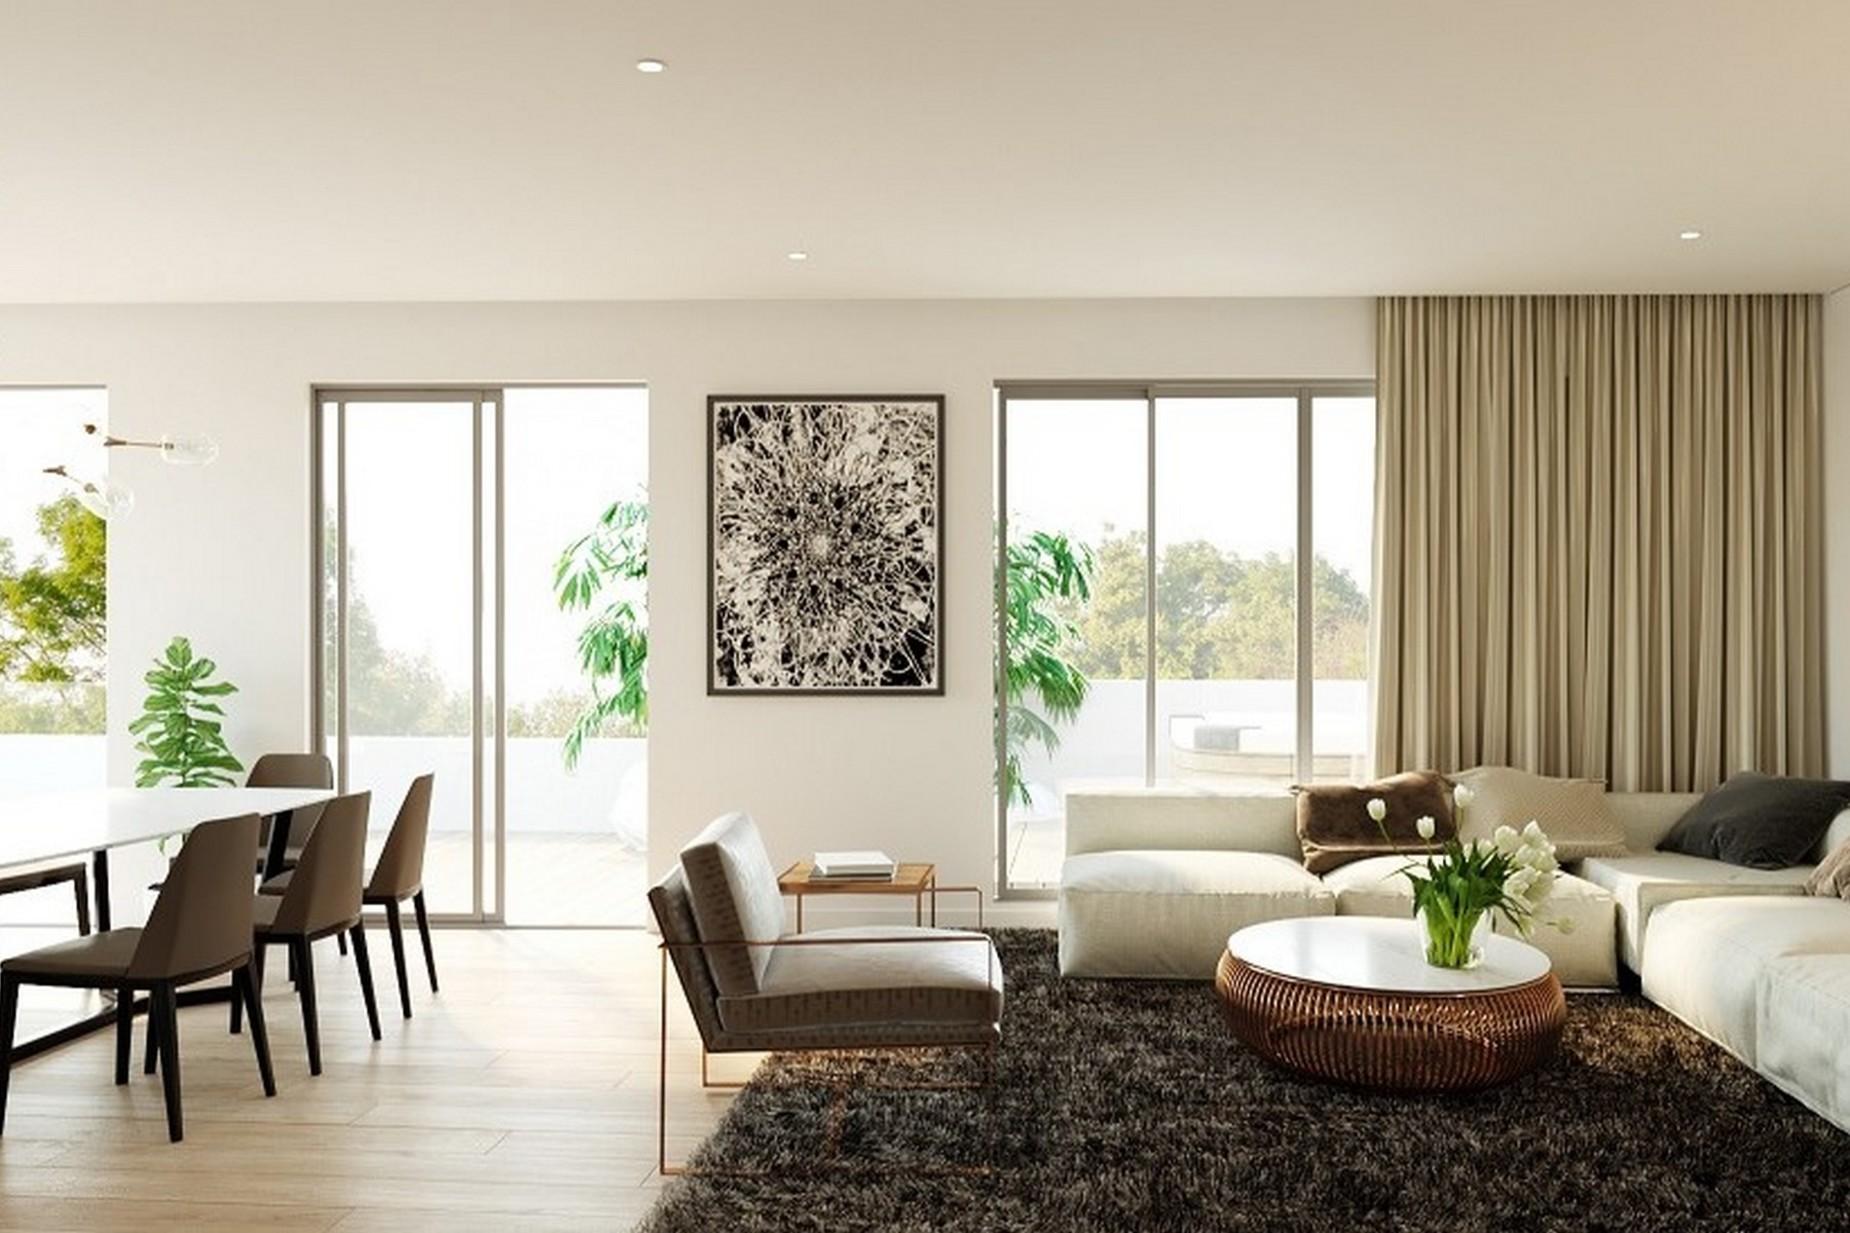 2 bed Apartment For Sale in Marsascala, Marsascala - thumb 4